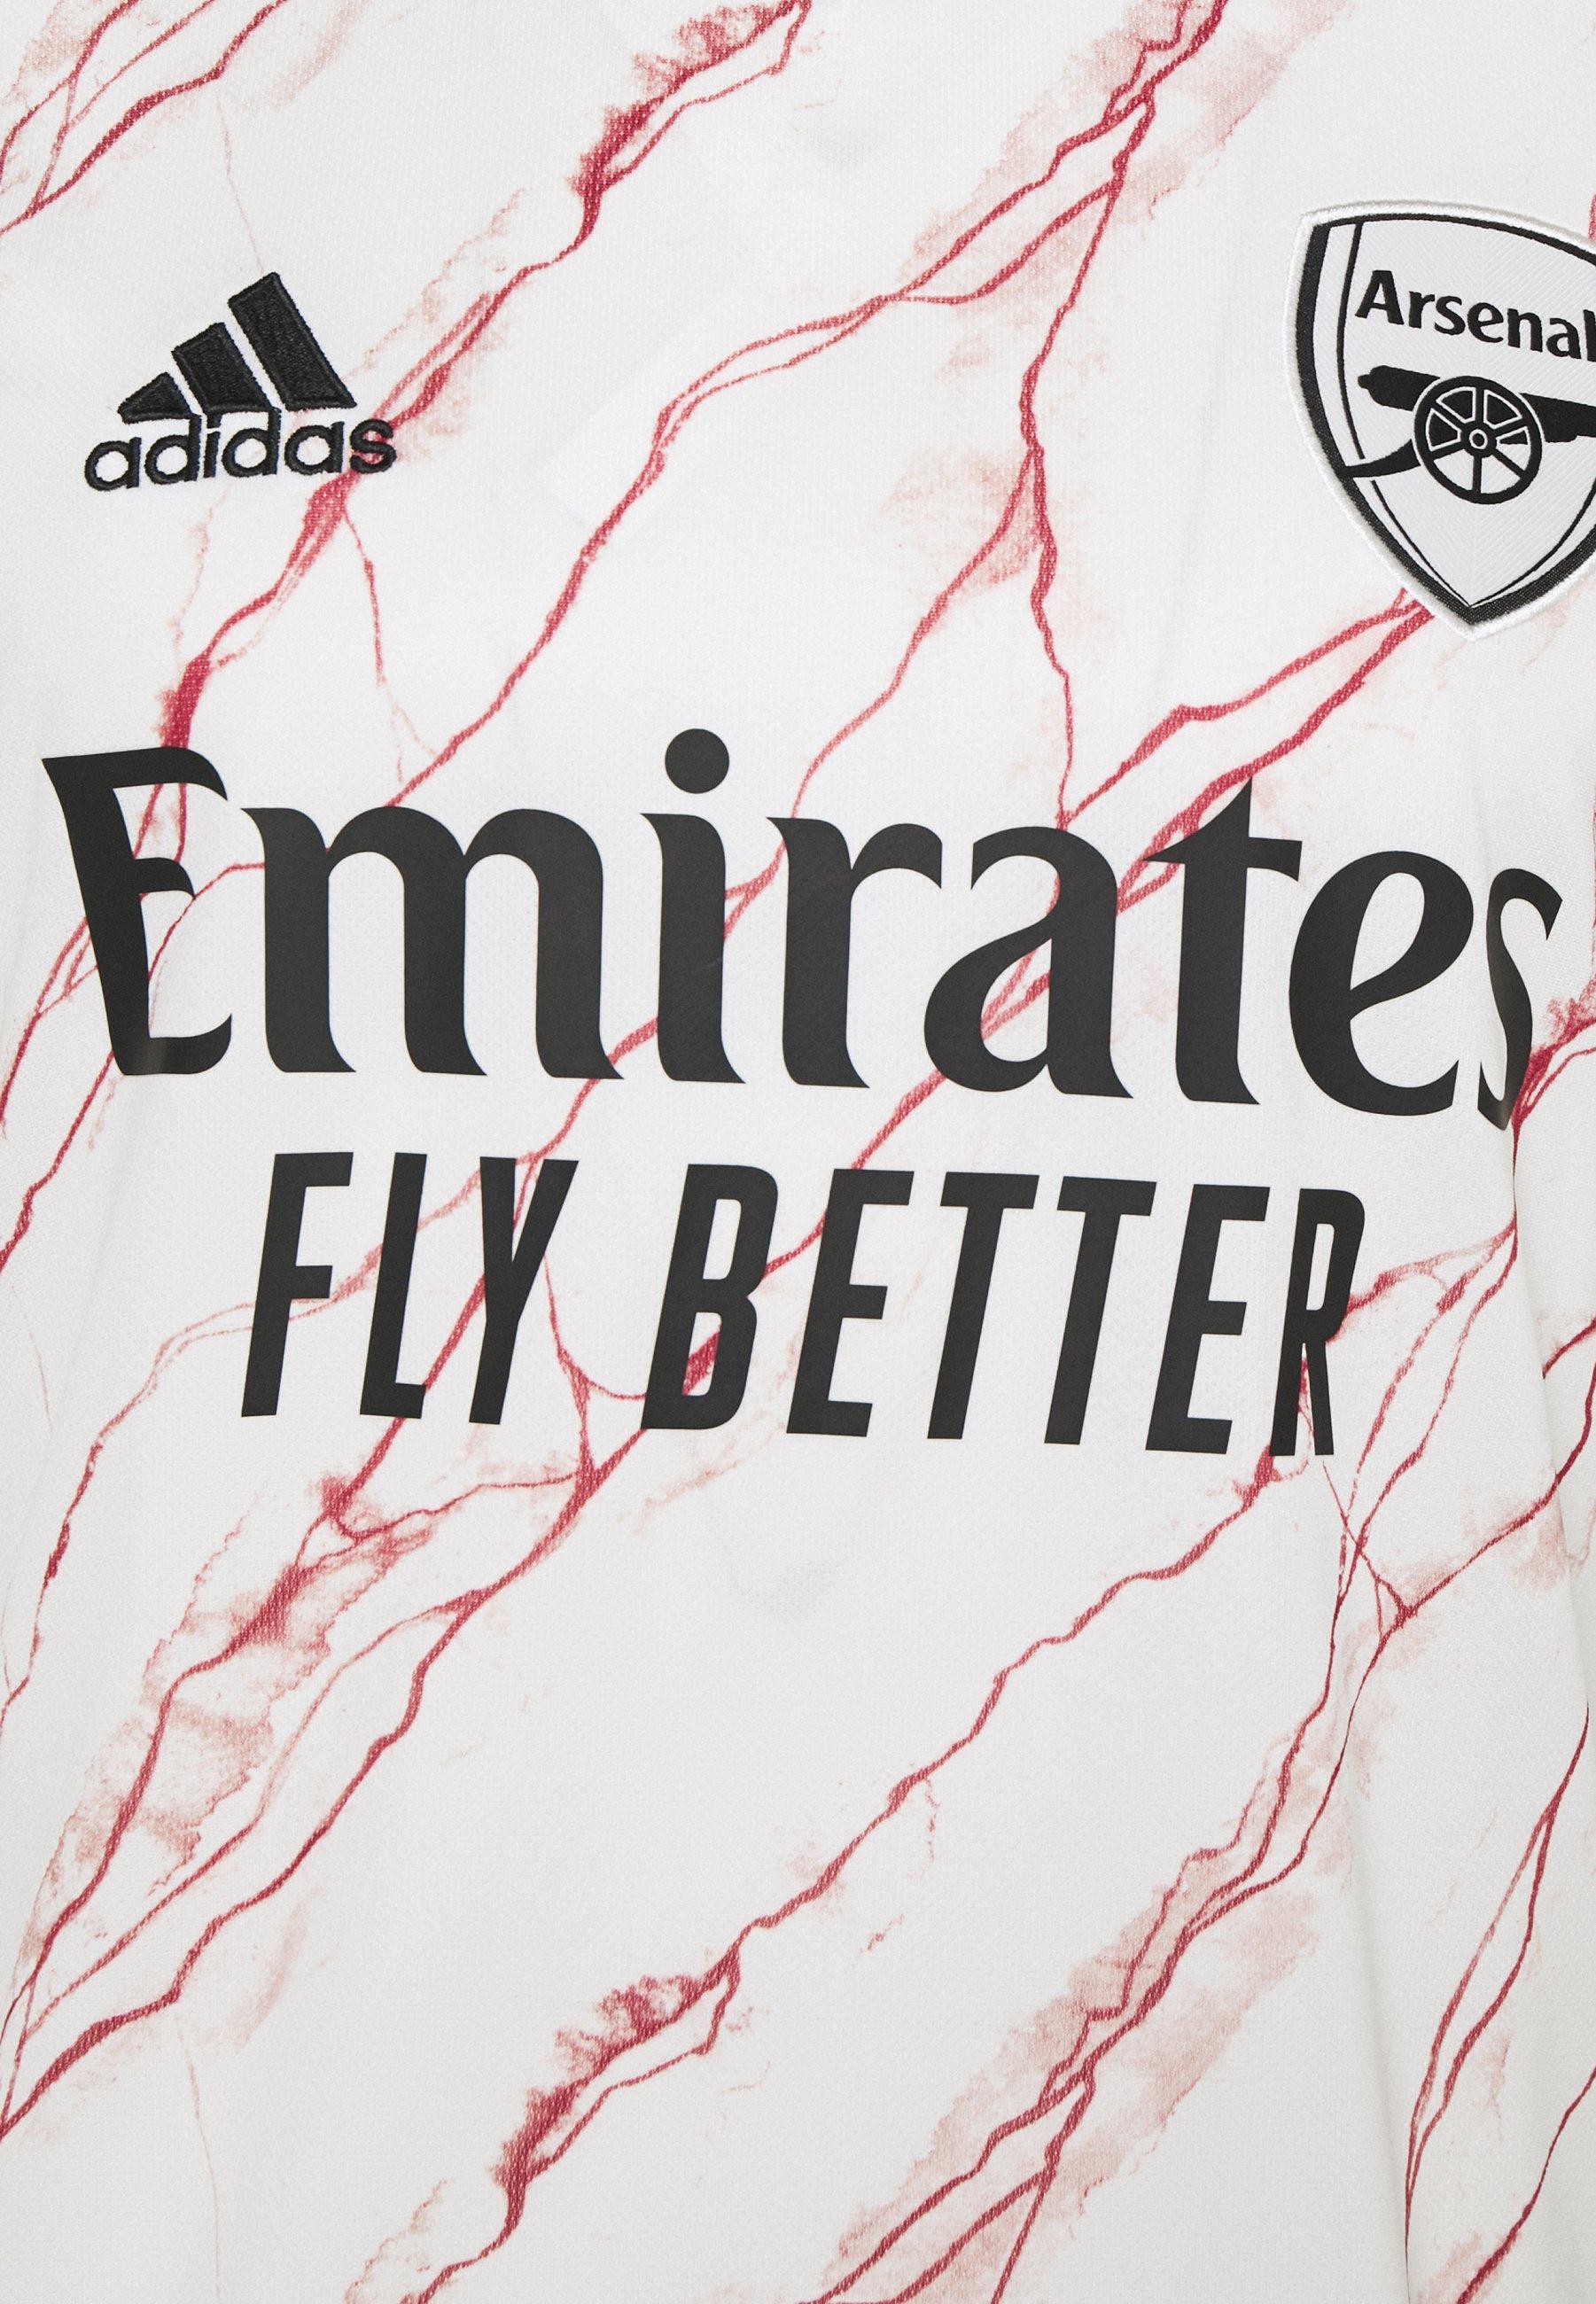 Classic Limit Discount Men's Clothing adidas Performance ARSENAL FC AEROREADY SPORTS FOOTBALL Club wear clowhi/black GUr8RlB31 BW3aAiu4m